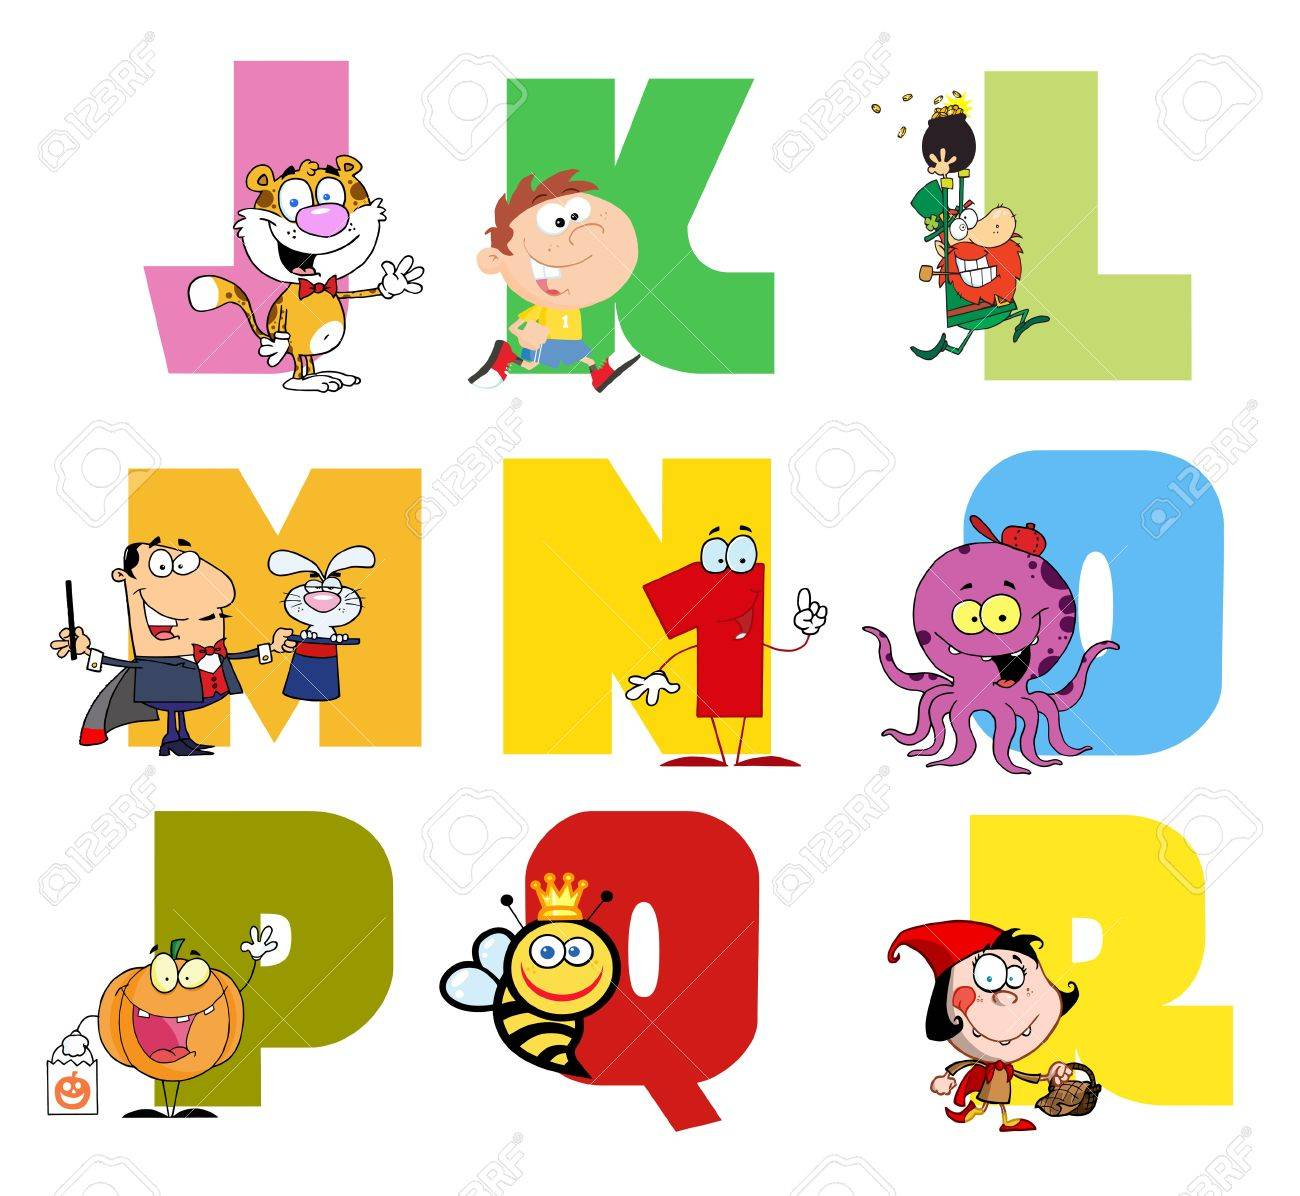 Joyful Cartoon Alphabet Collection 2 Stock Vector - 9789368